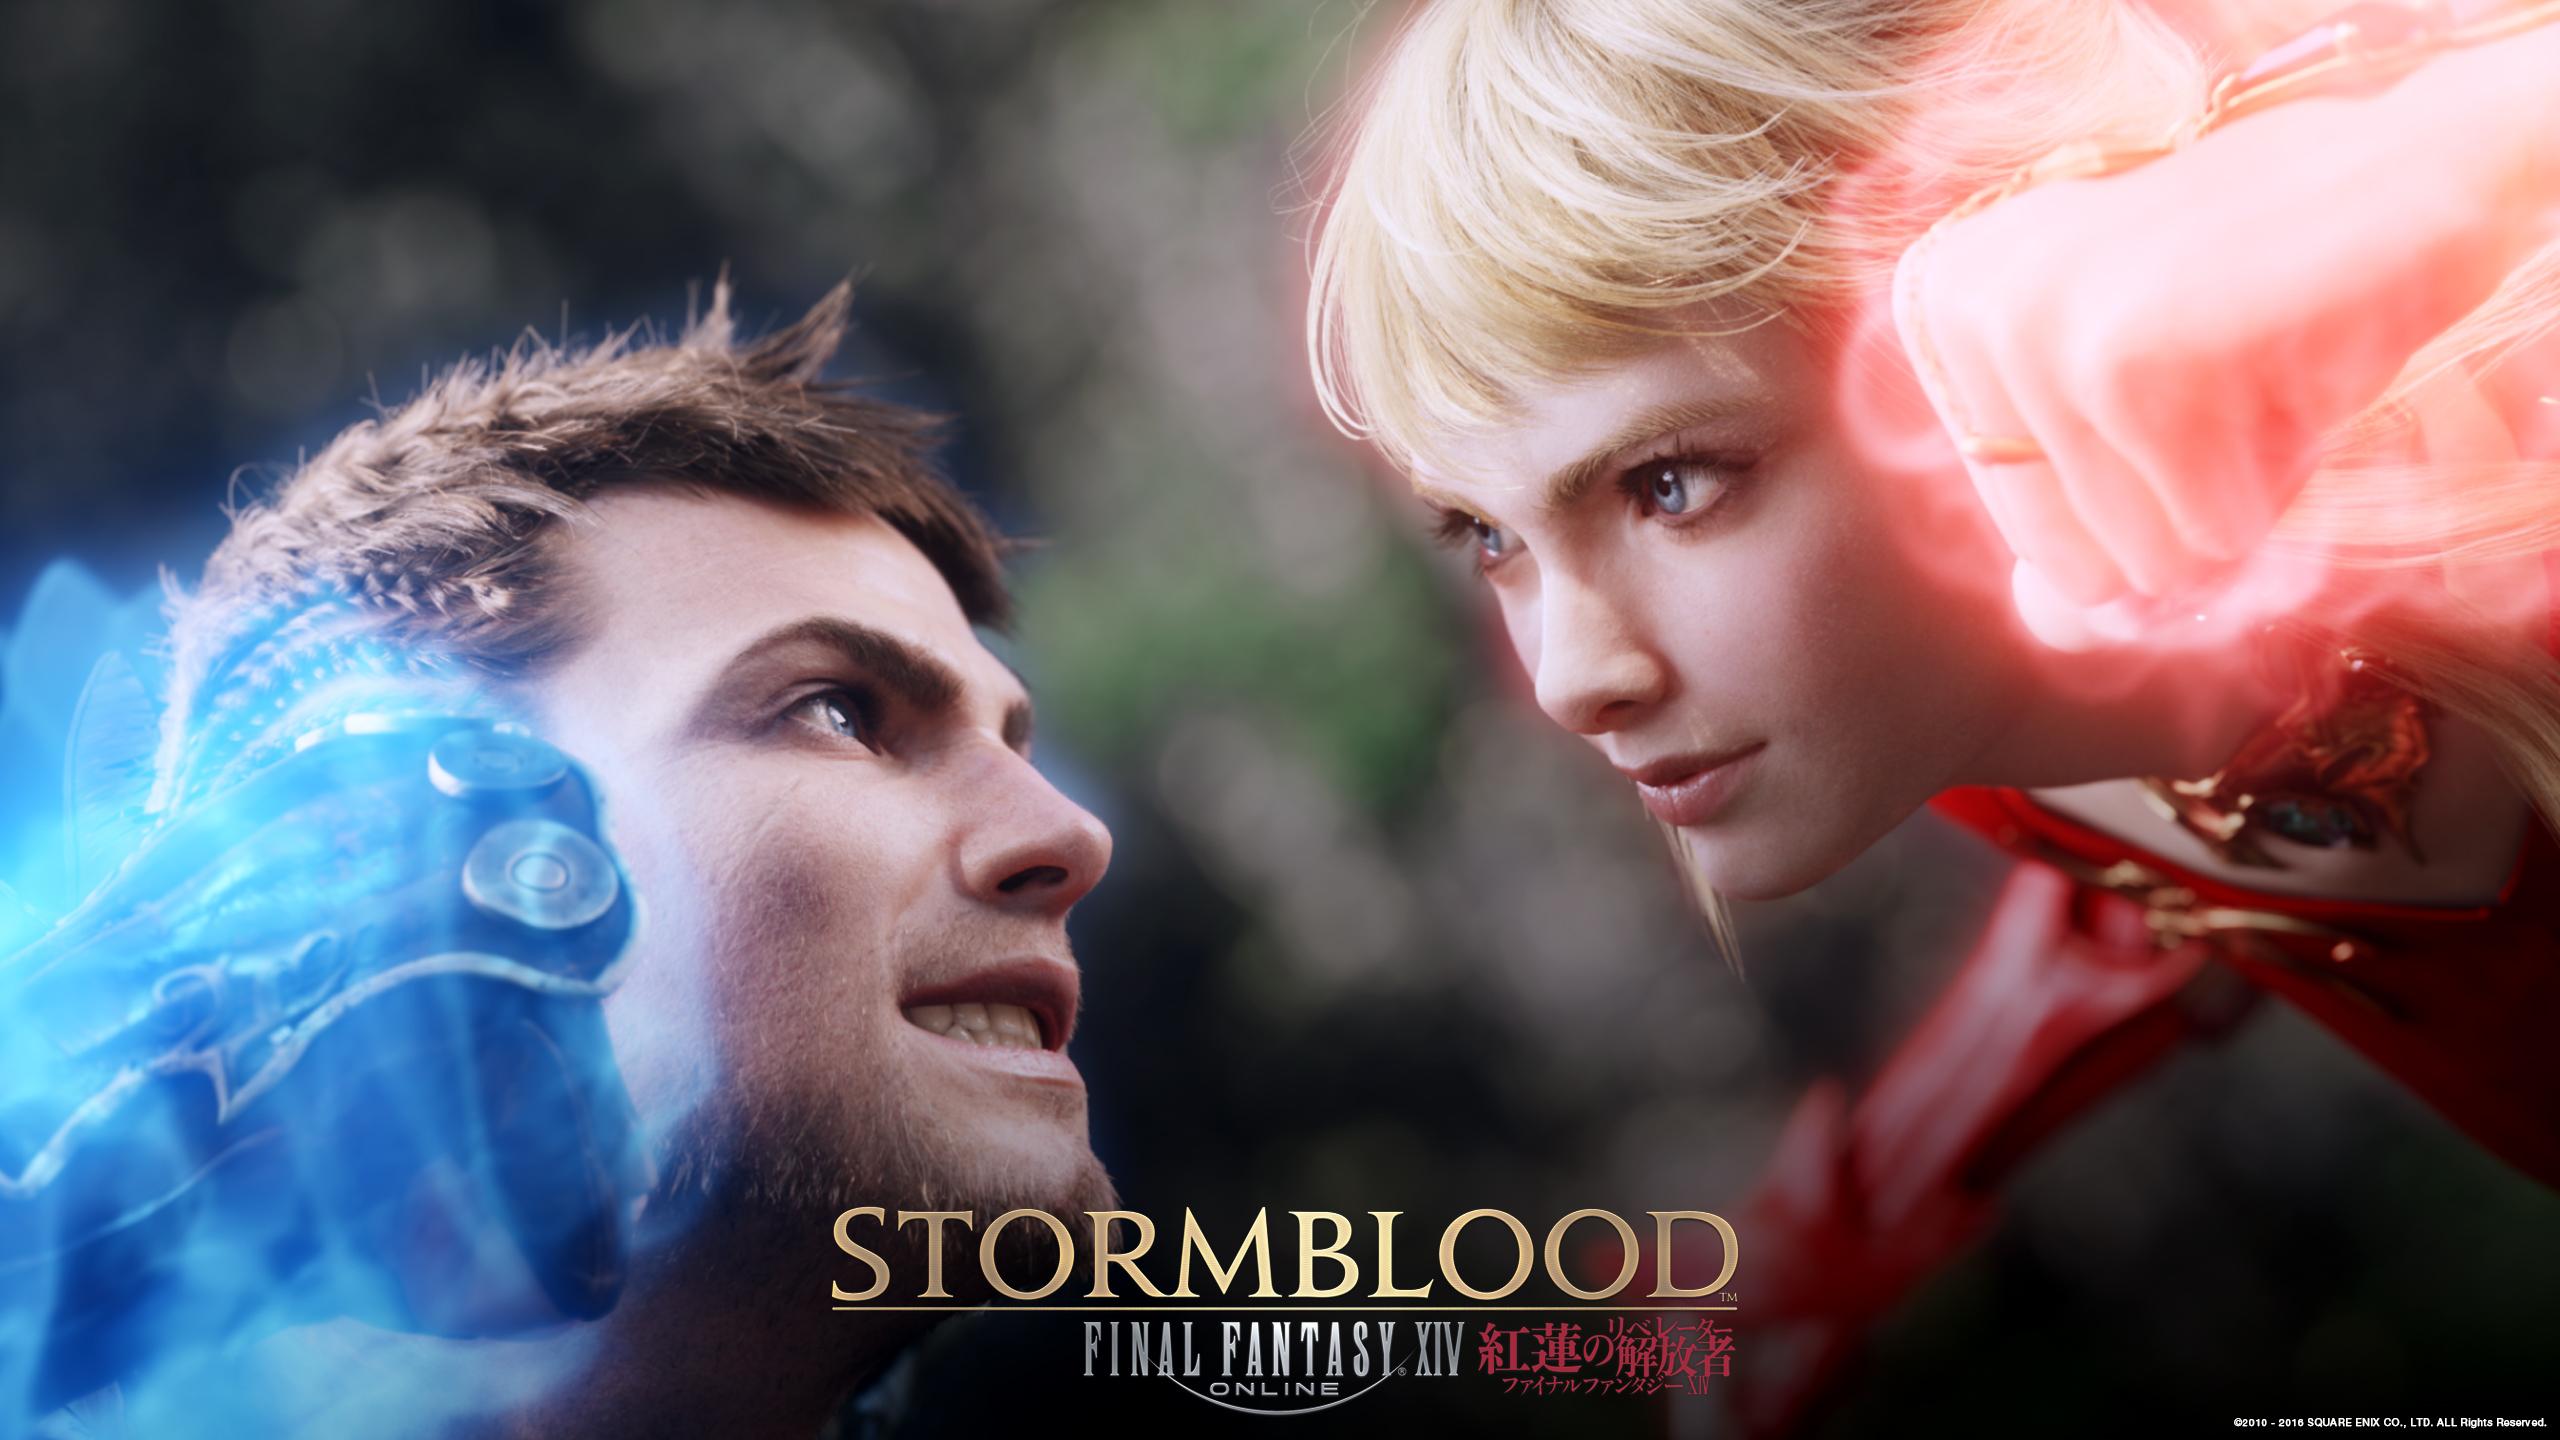 Final Fantasy Xiv Stormblood Raises The Bar Geekysweetie Com